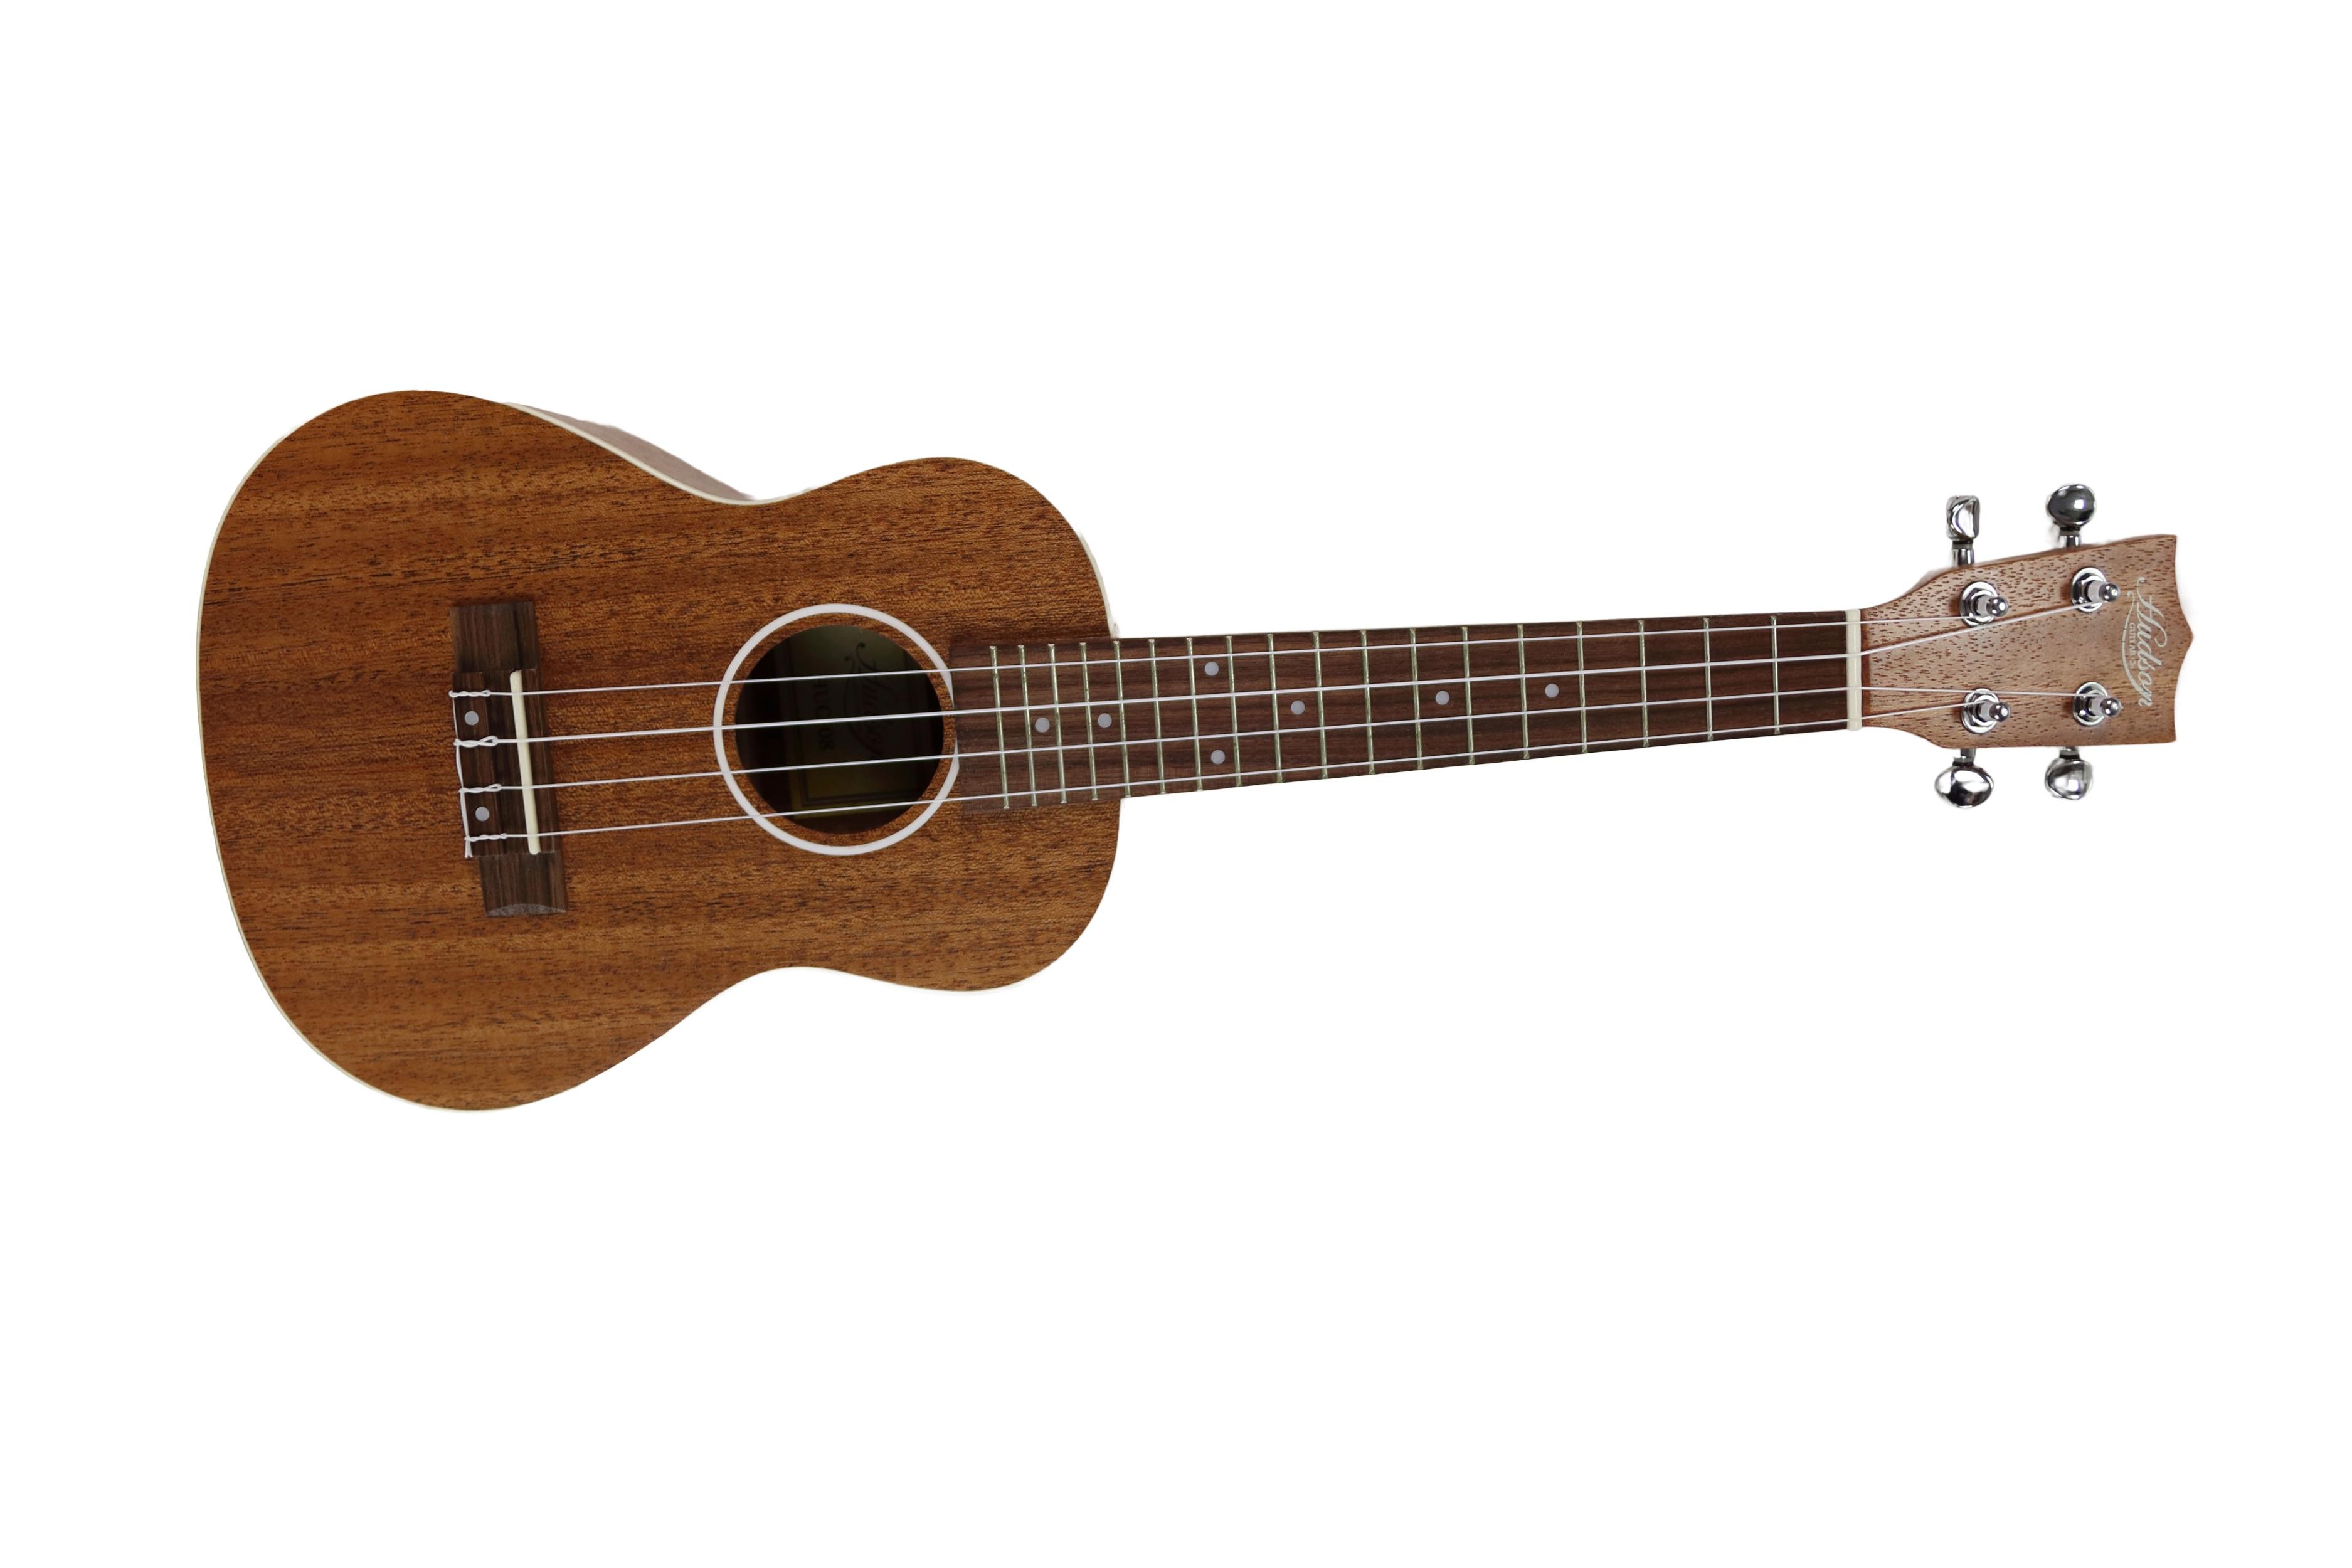 HU-08 concert ukulele